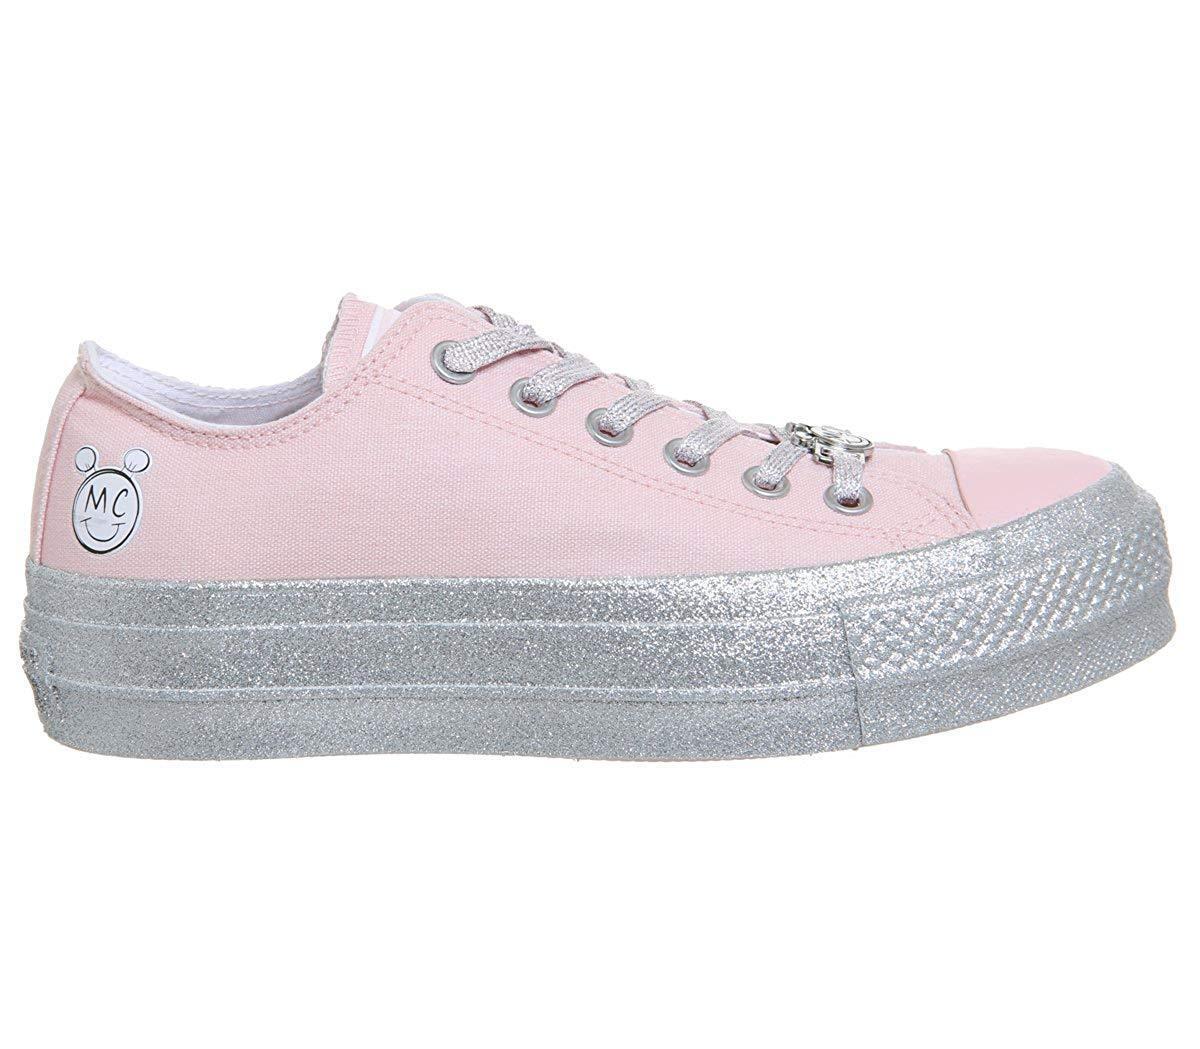 Converse Miley Cyrus CTAS Platform Low Sneaker Size  US US US 8 Pink-Silver Glitter 4d85d5